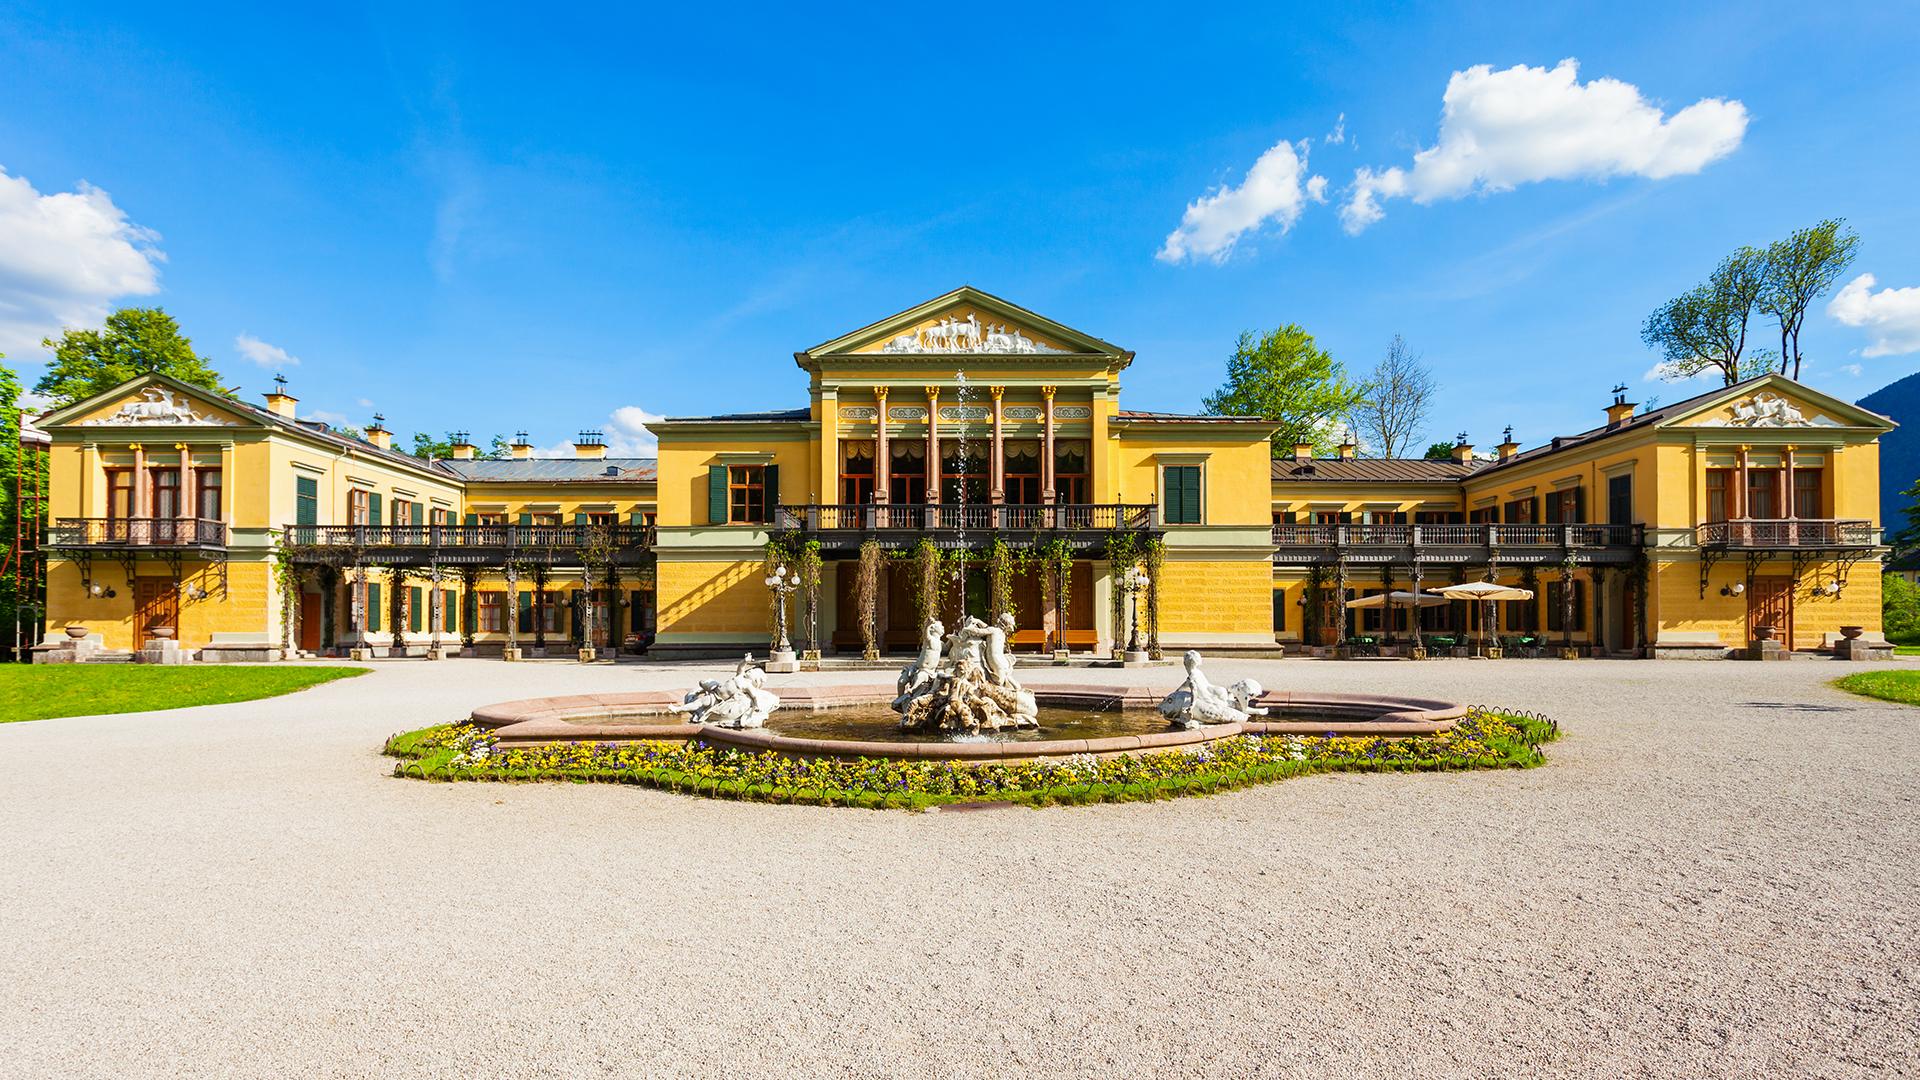 Bad-Ischl-Kaiservilla